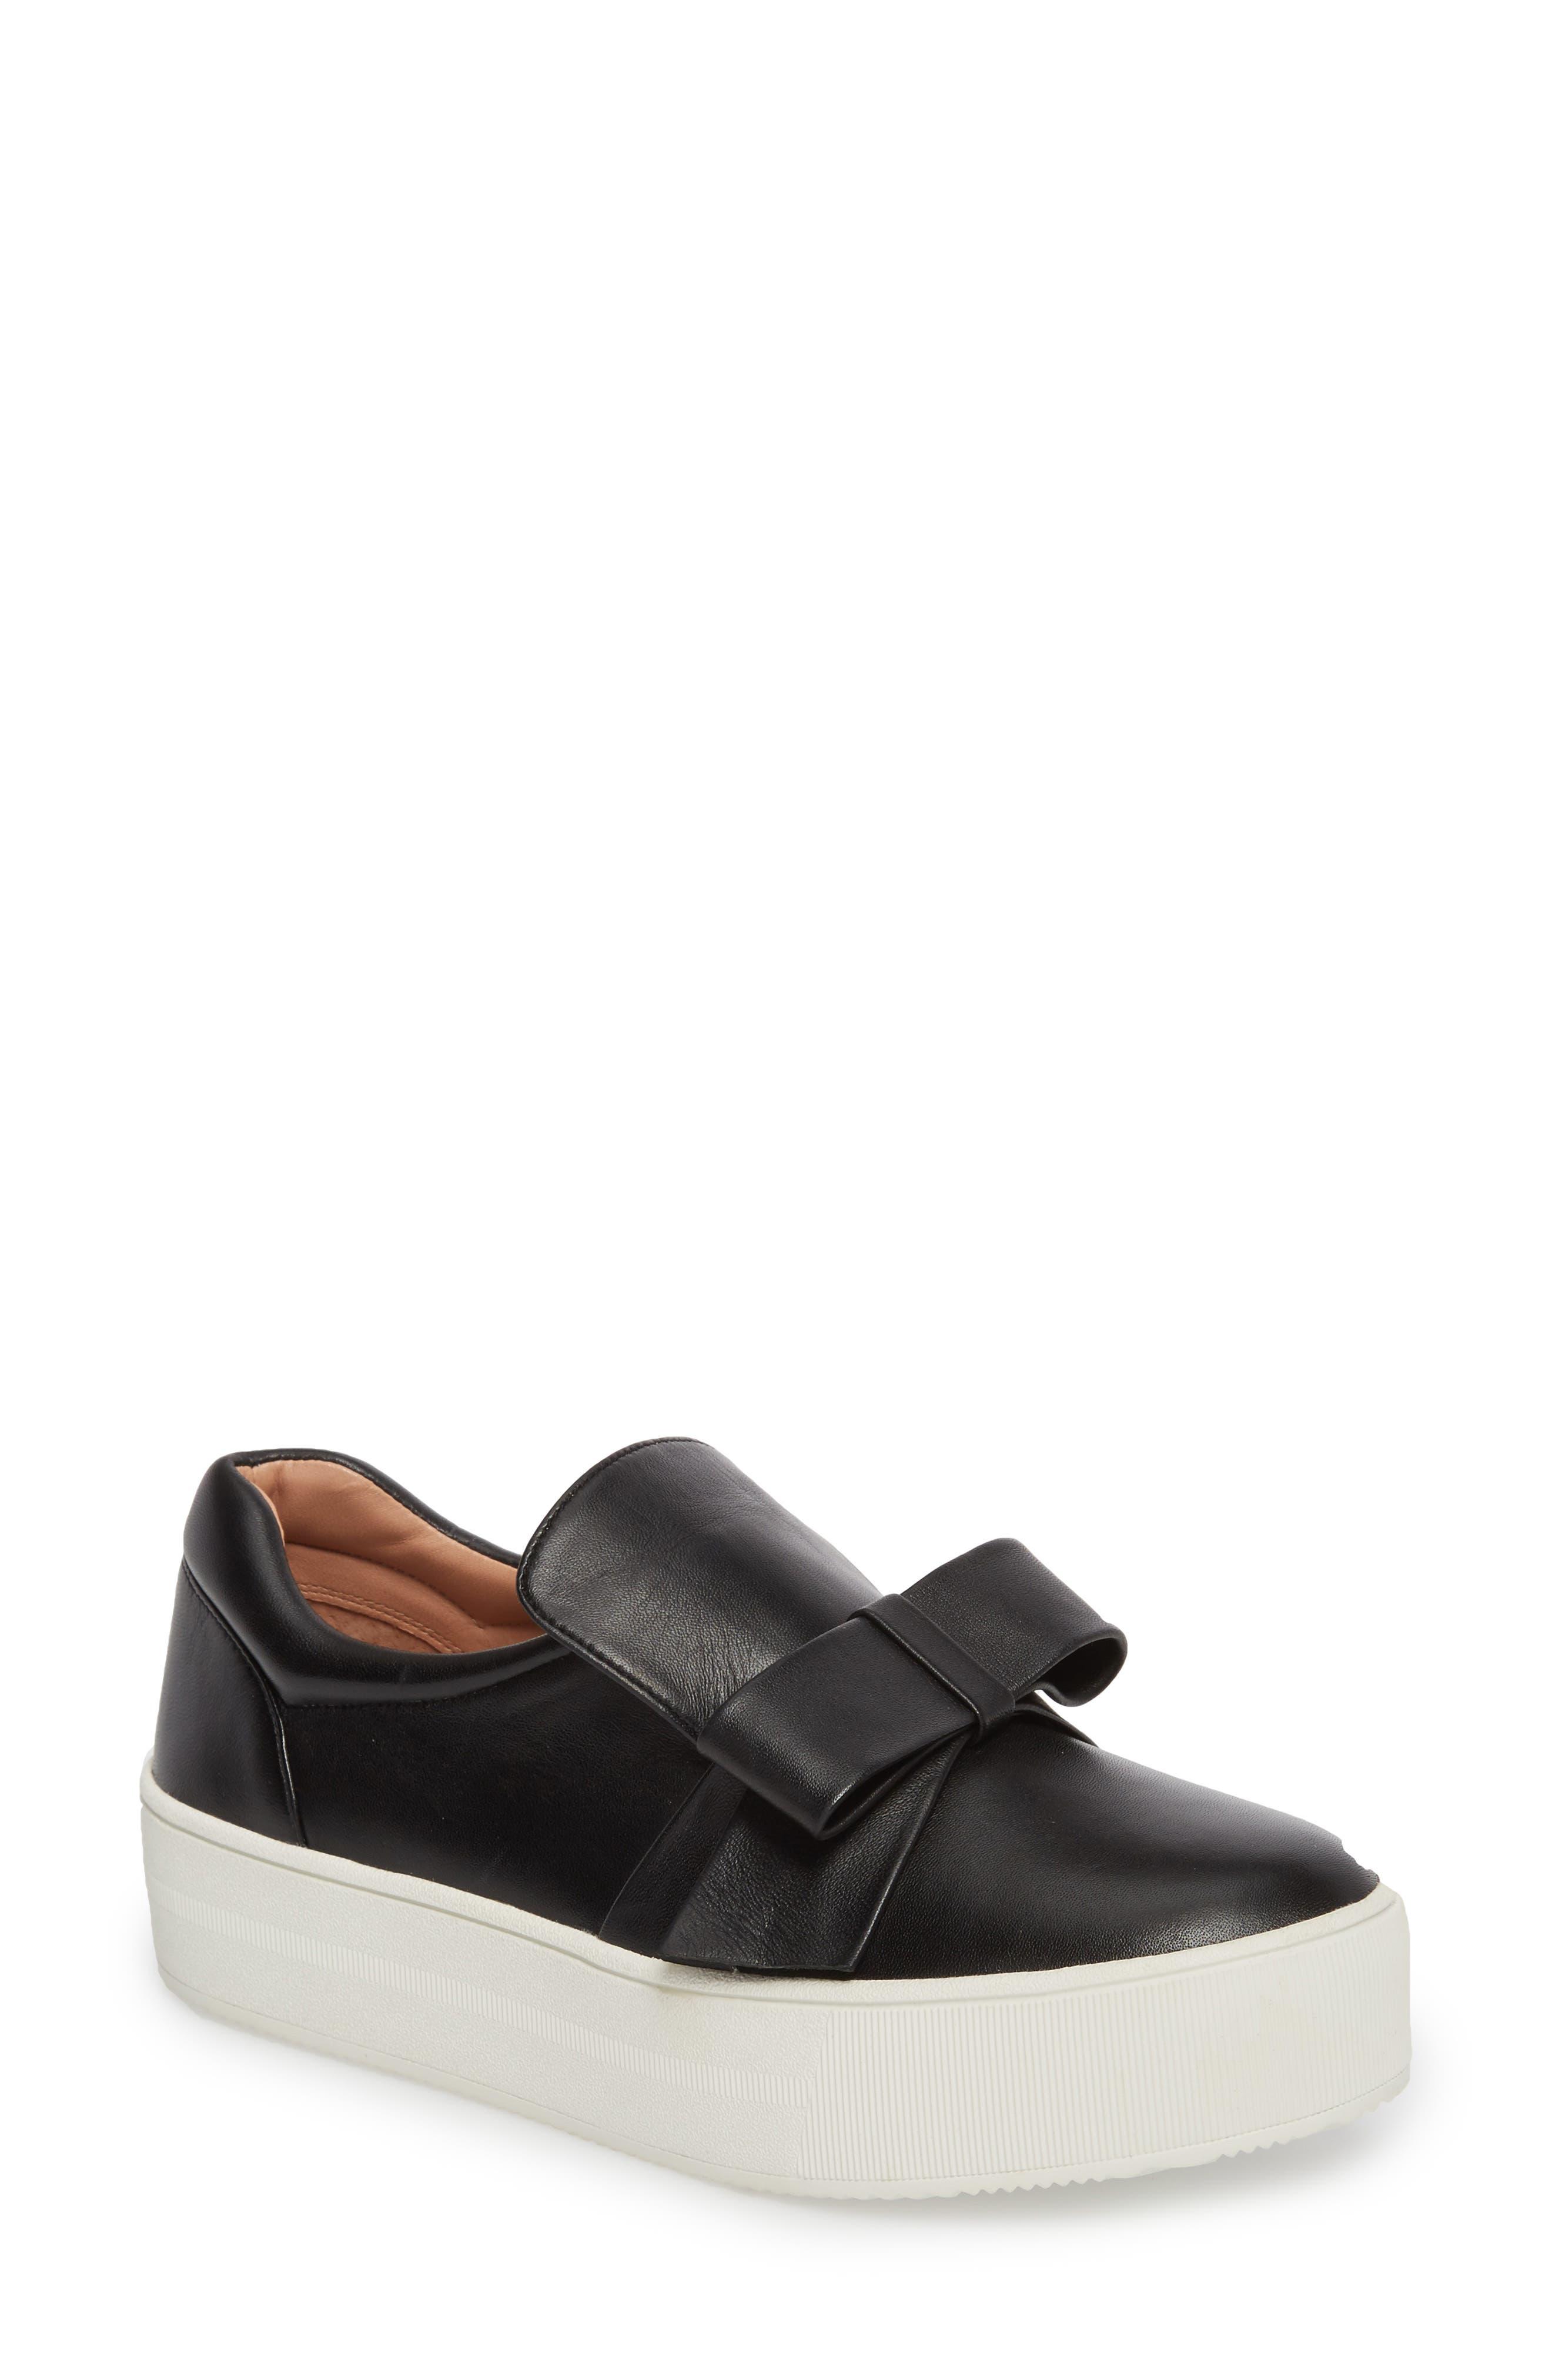 Vania Bow Platform Sneaker,                         Main,                         color, Black Leather